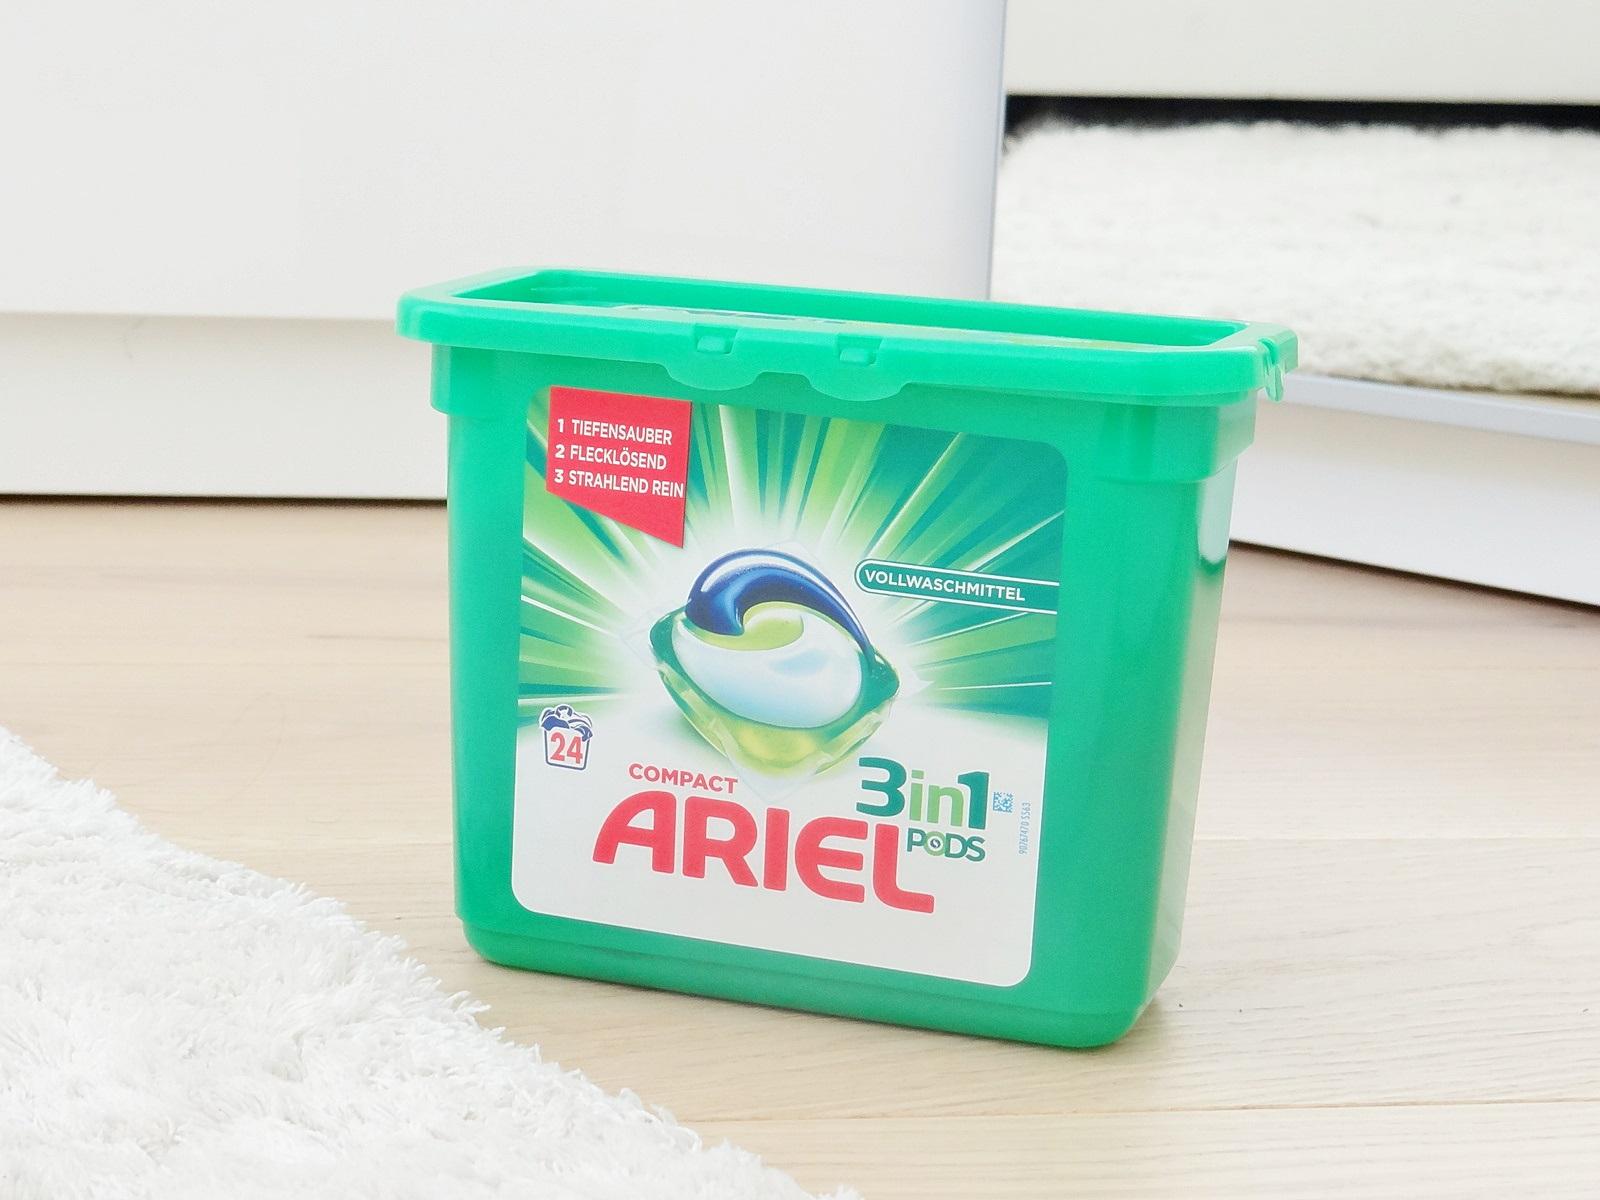 Ariel 3in1 Pods